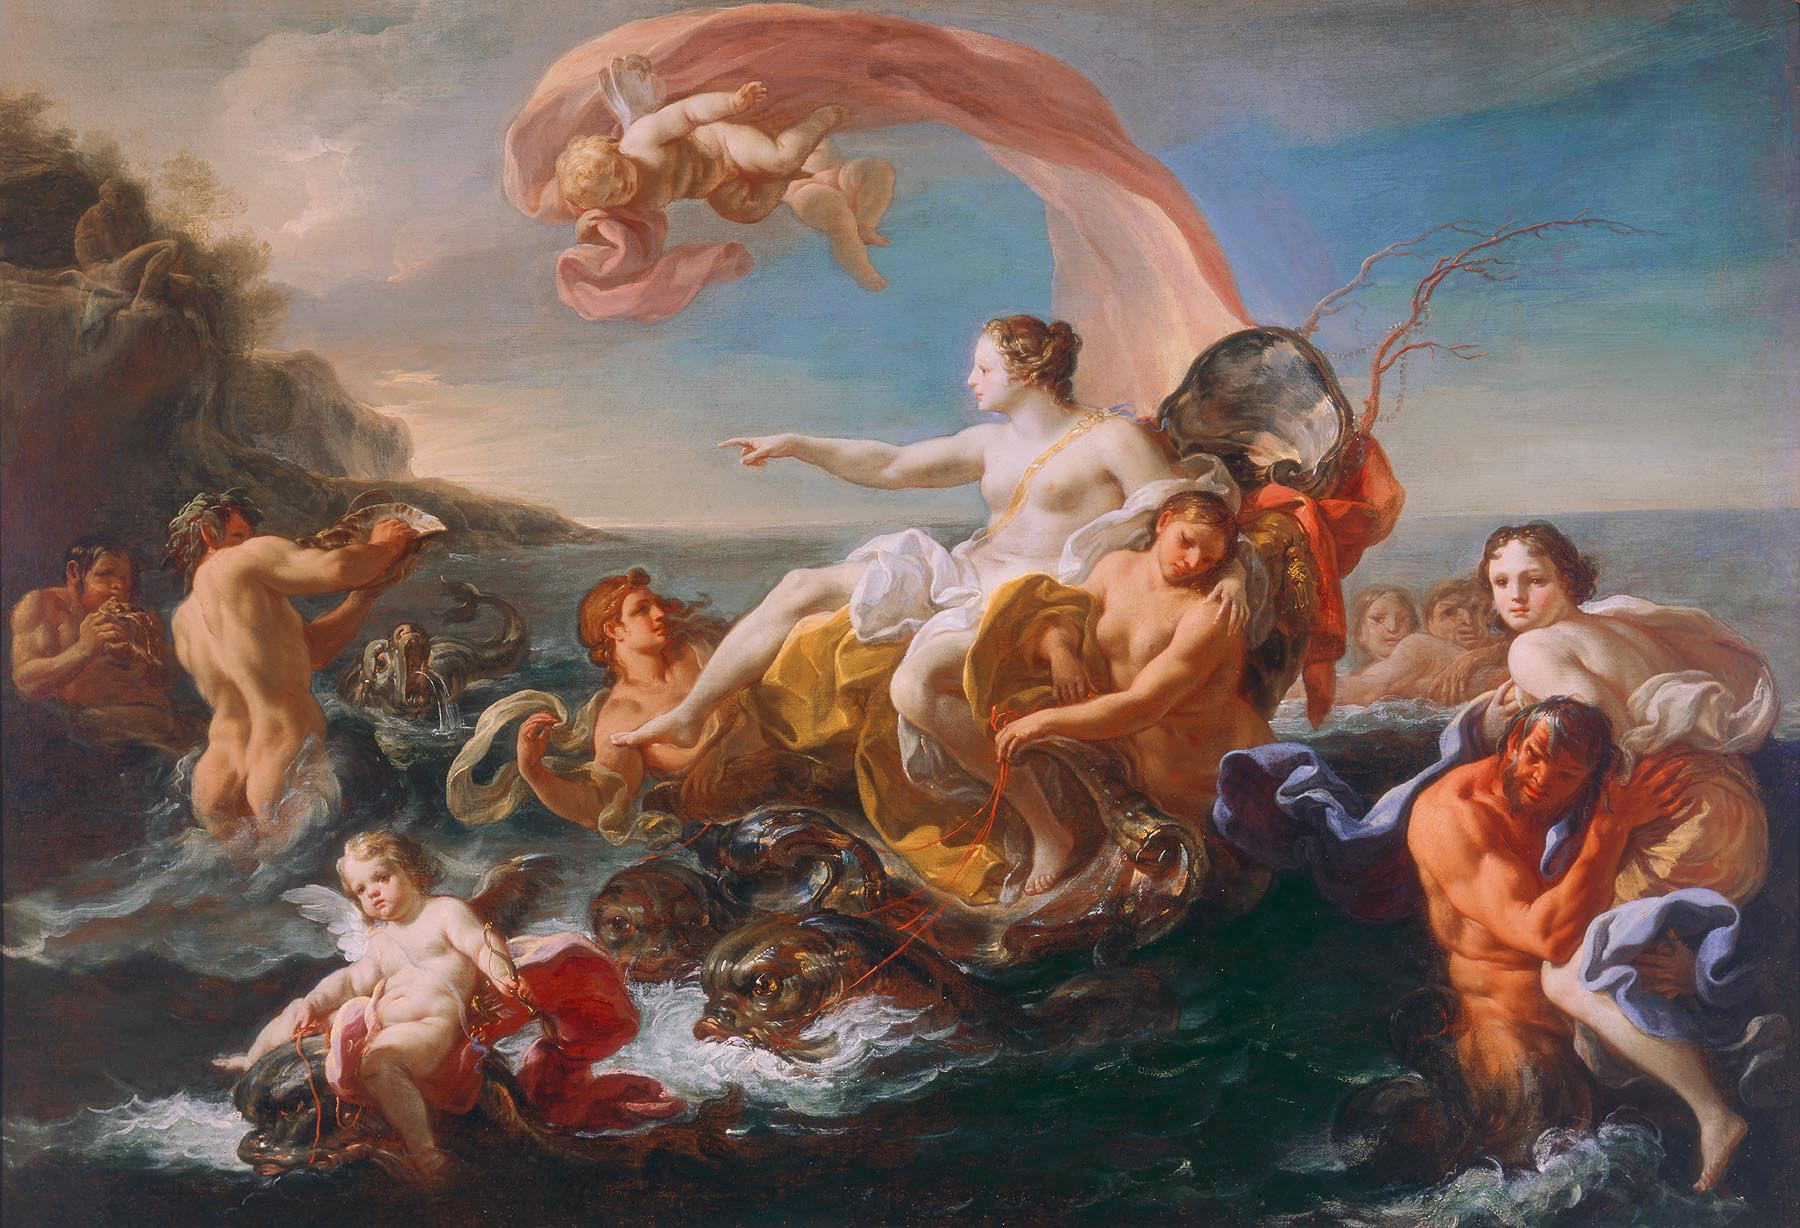 Corrado Giaquinto (Italian, 1703–1766) The Triumph of Galatea, ca. 1752 Oil on canvas 33 1/2 x 48 1/2 in. (85.09 x 123.19 cm) Gift of Mr. and Mrs. Myron Laskin M1970.68.2 Photo credit Larry Sanders